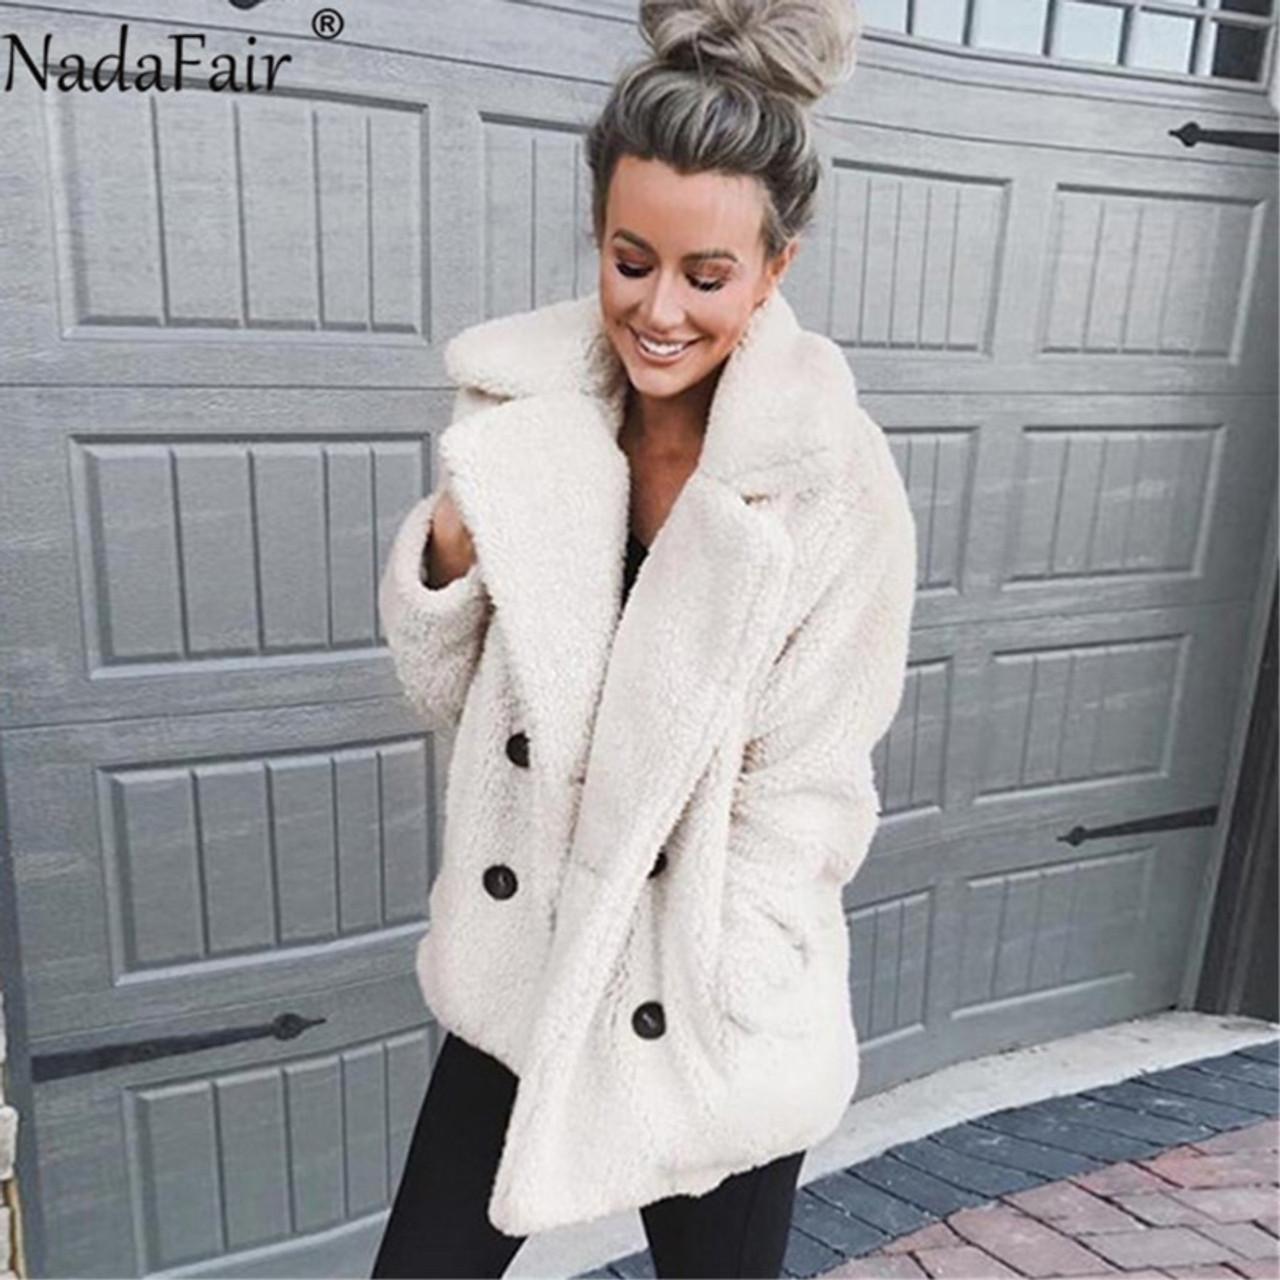 8d3efc537b9 ... Nadafair plus size fleece faux fur jacket coat women winter pockets thick  teddy coat female soft ...